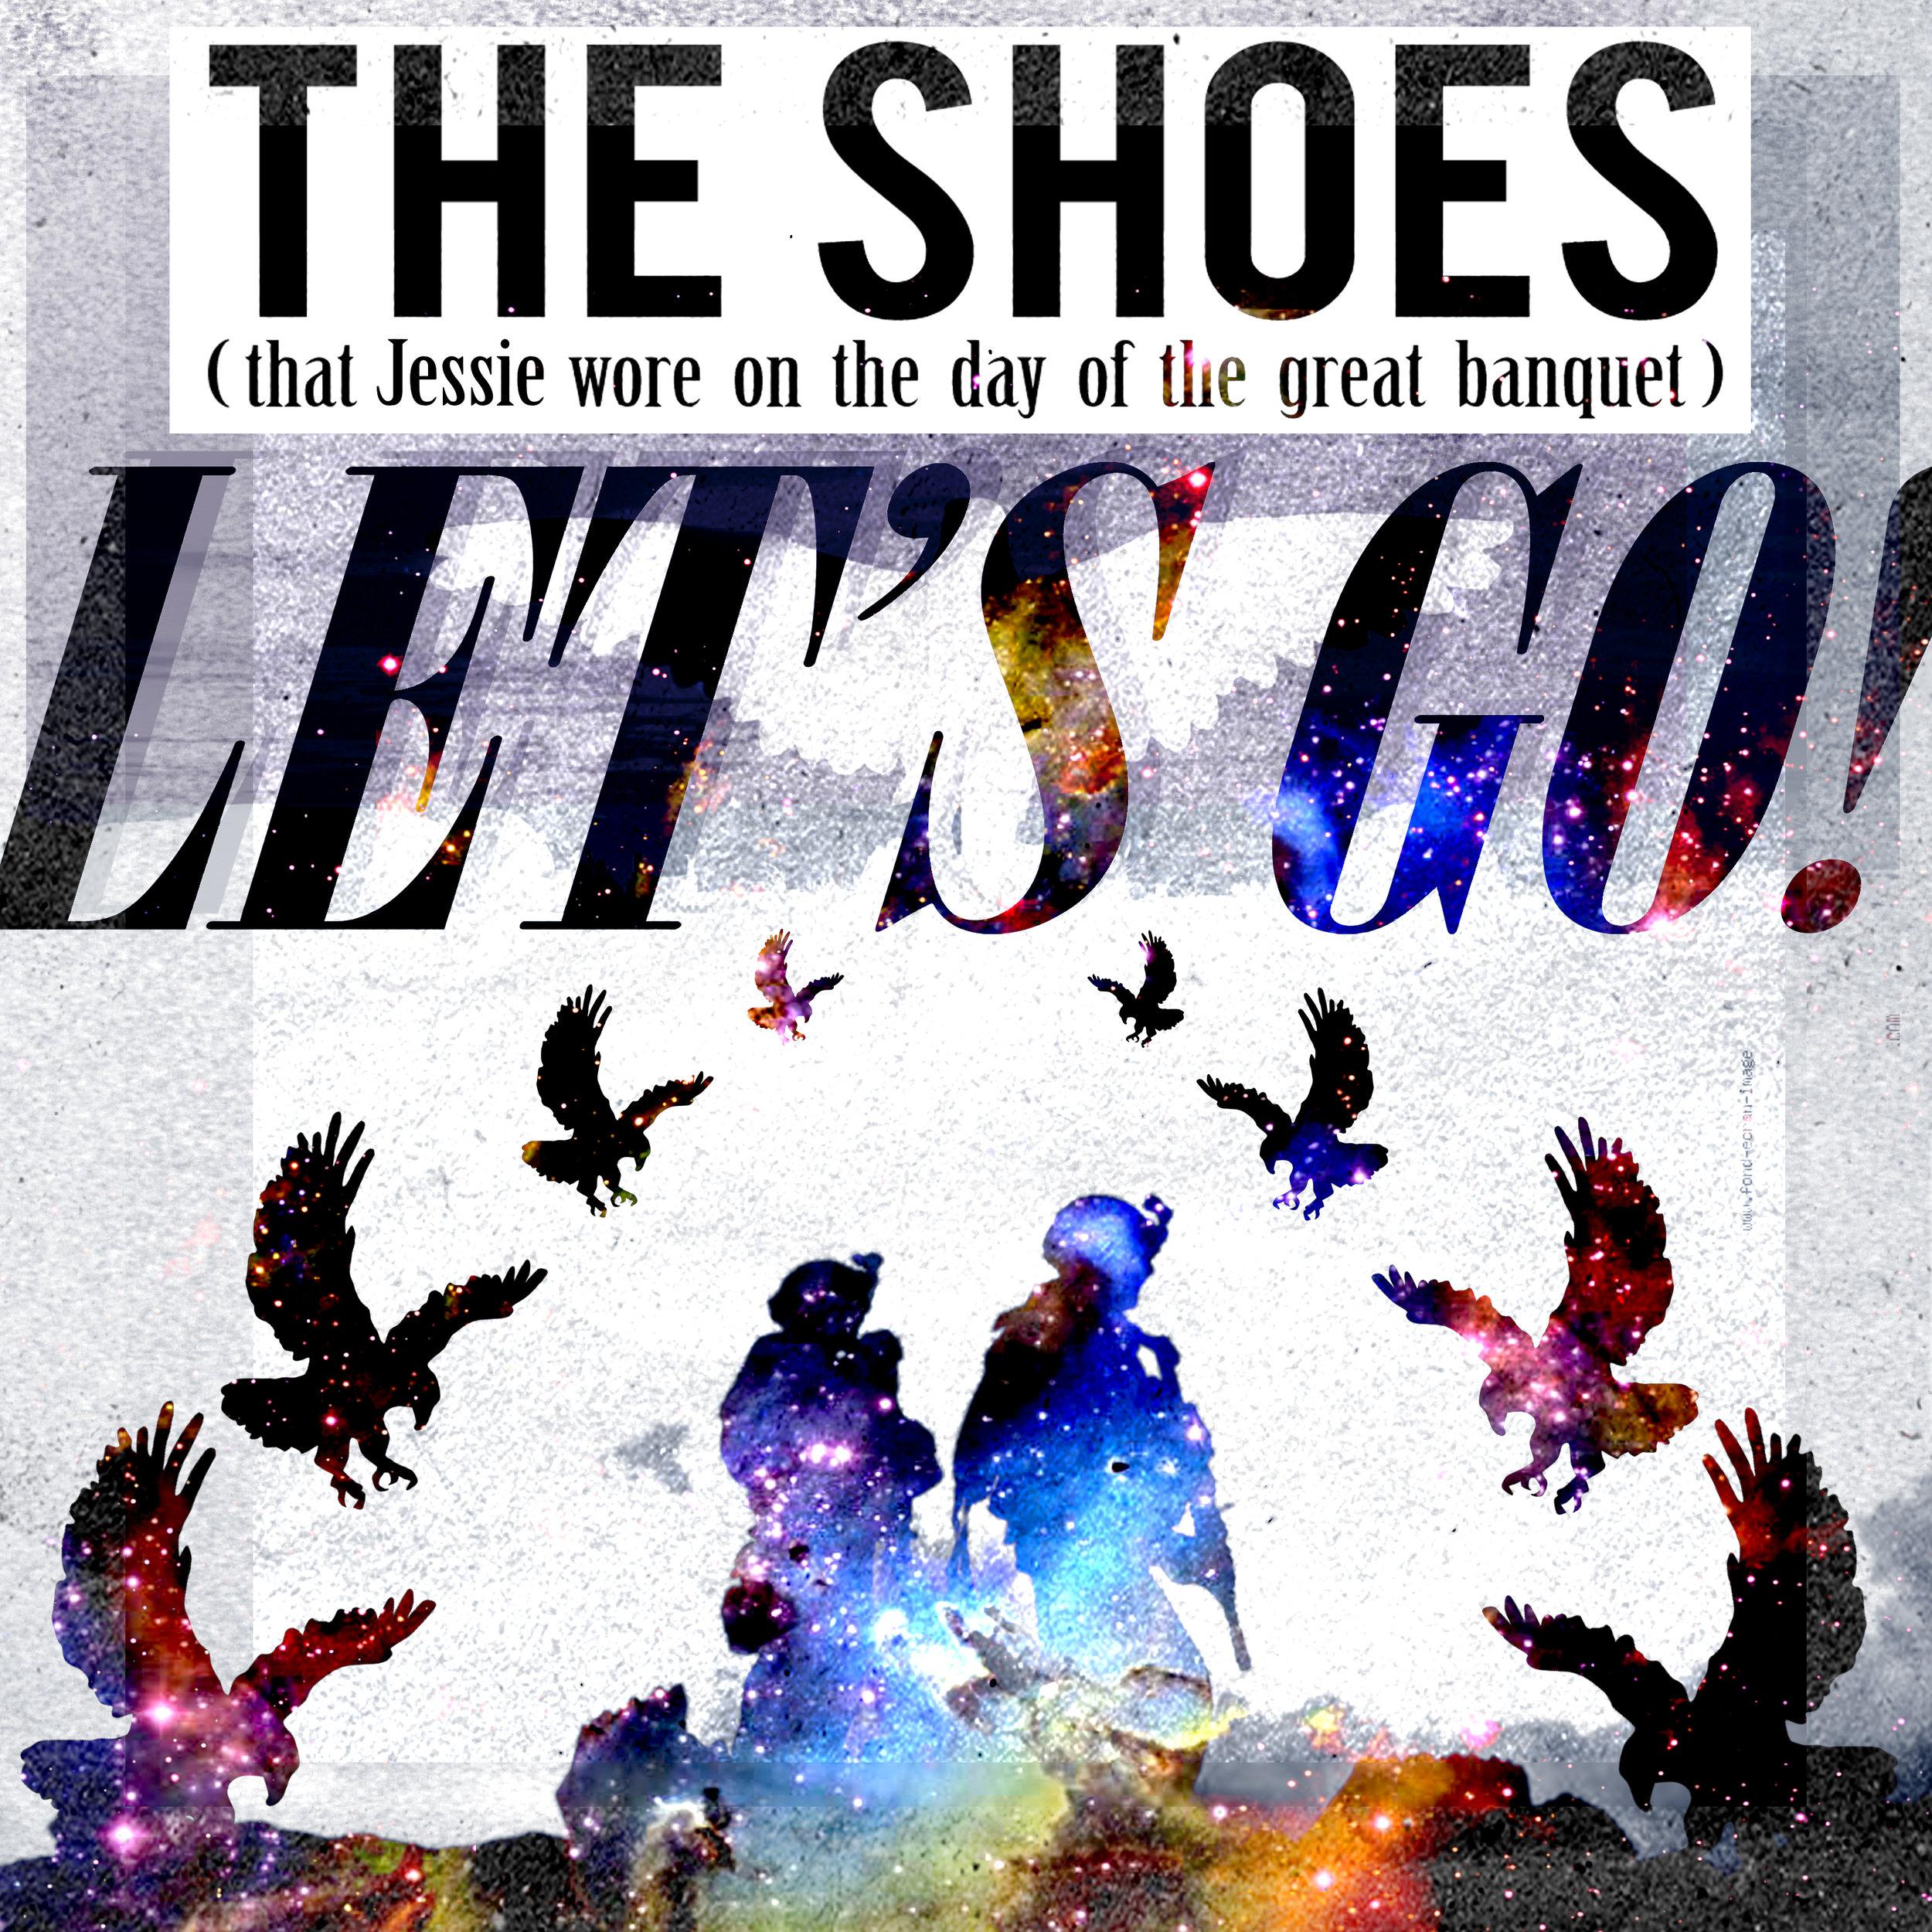 ksr the shoes let's go.jpg